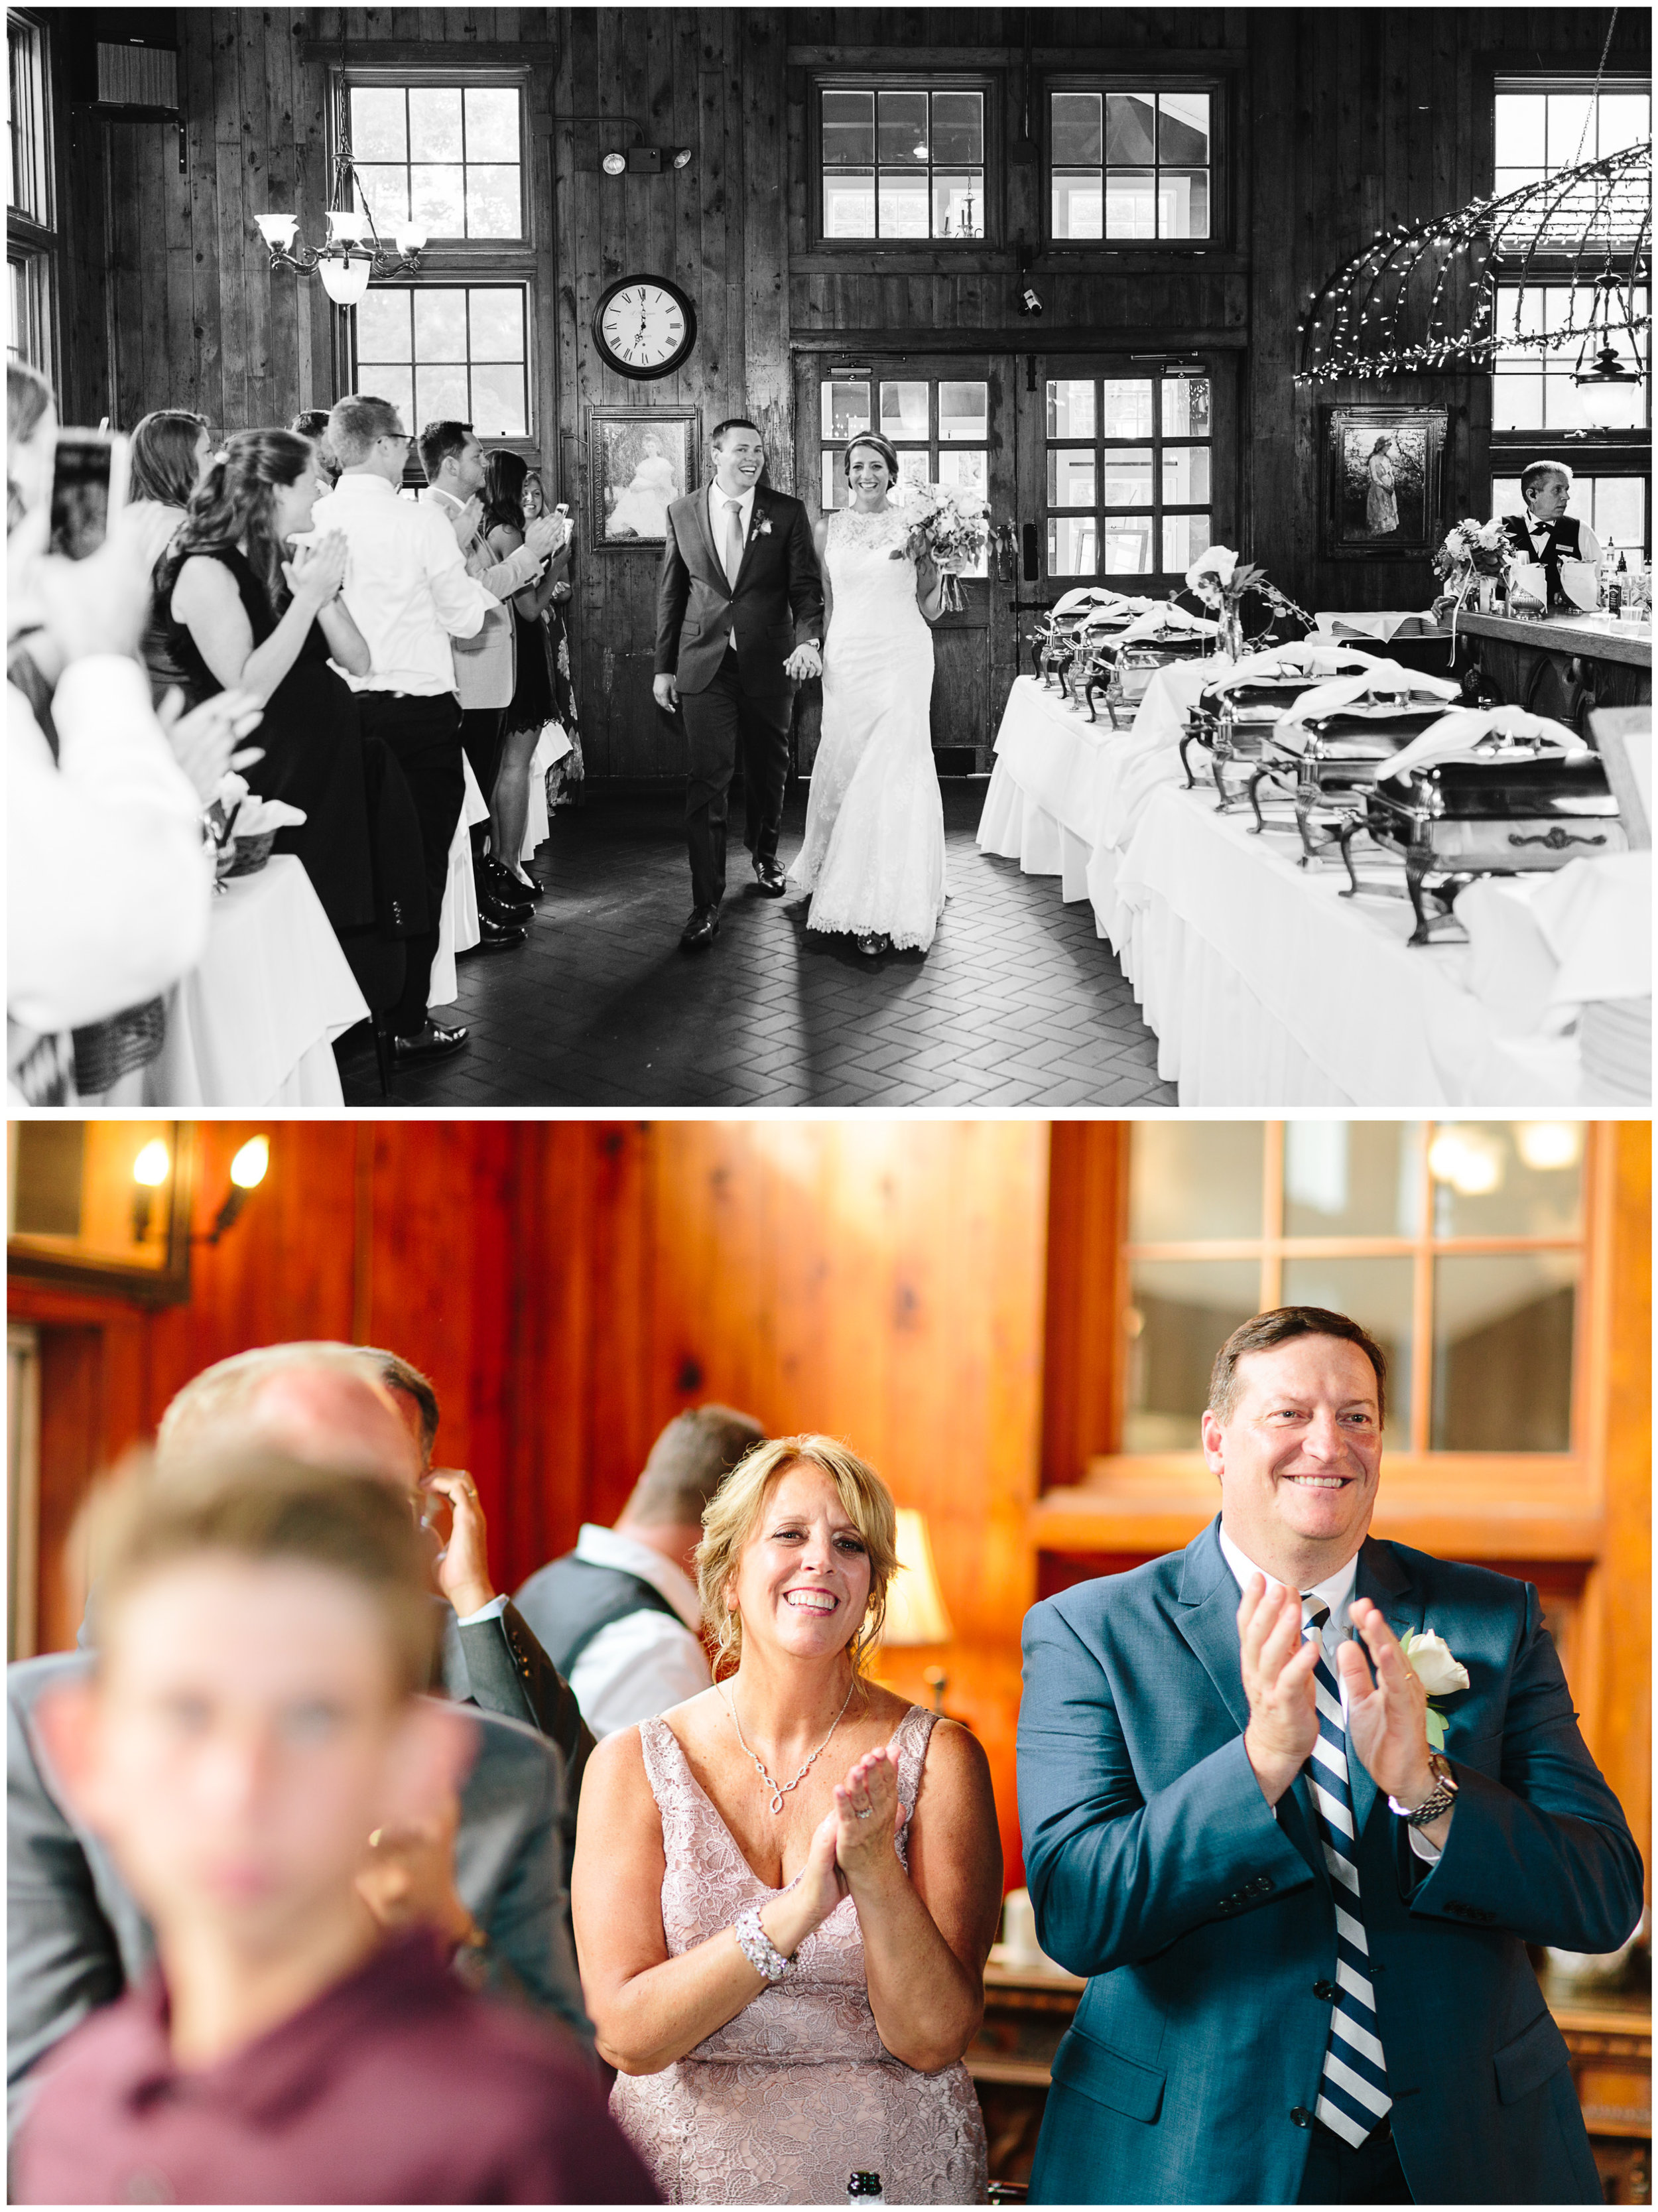 ann_arbor_michigan_wedding_81.jpg